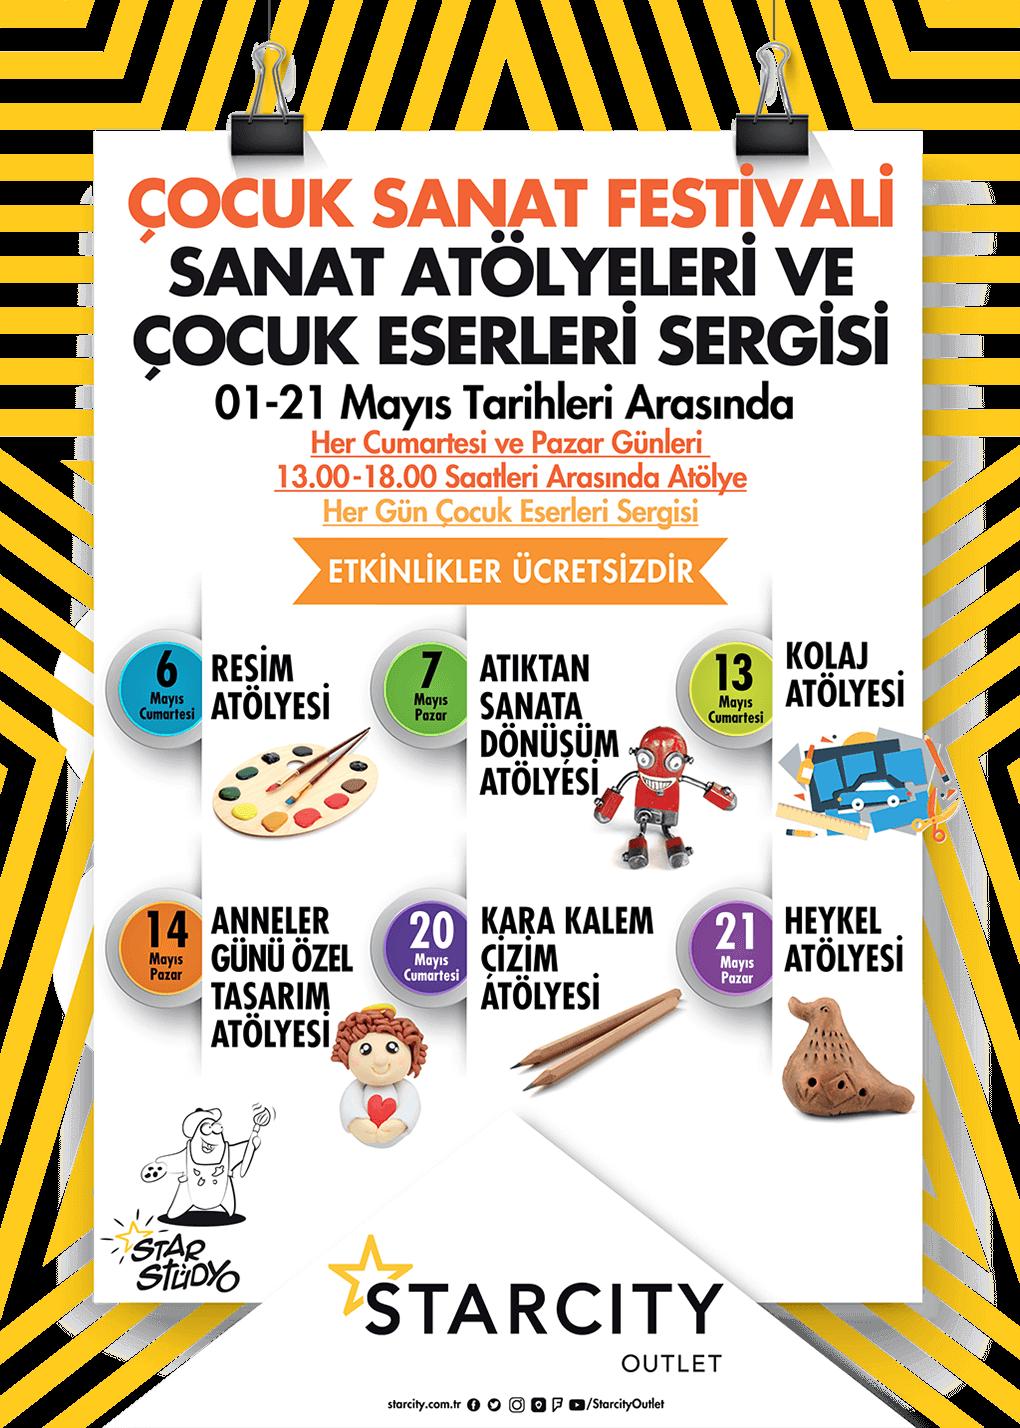 ÇOCUK SANAT FESTİVALİ